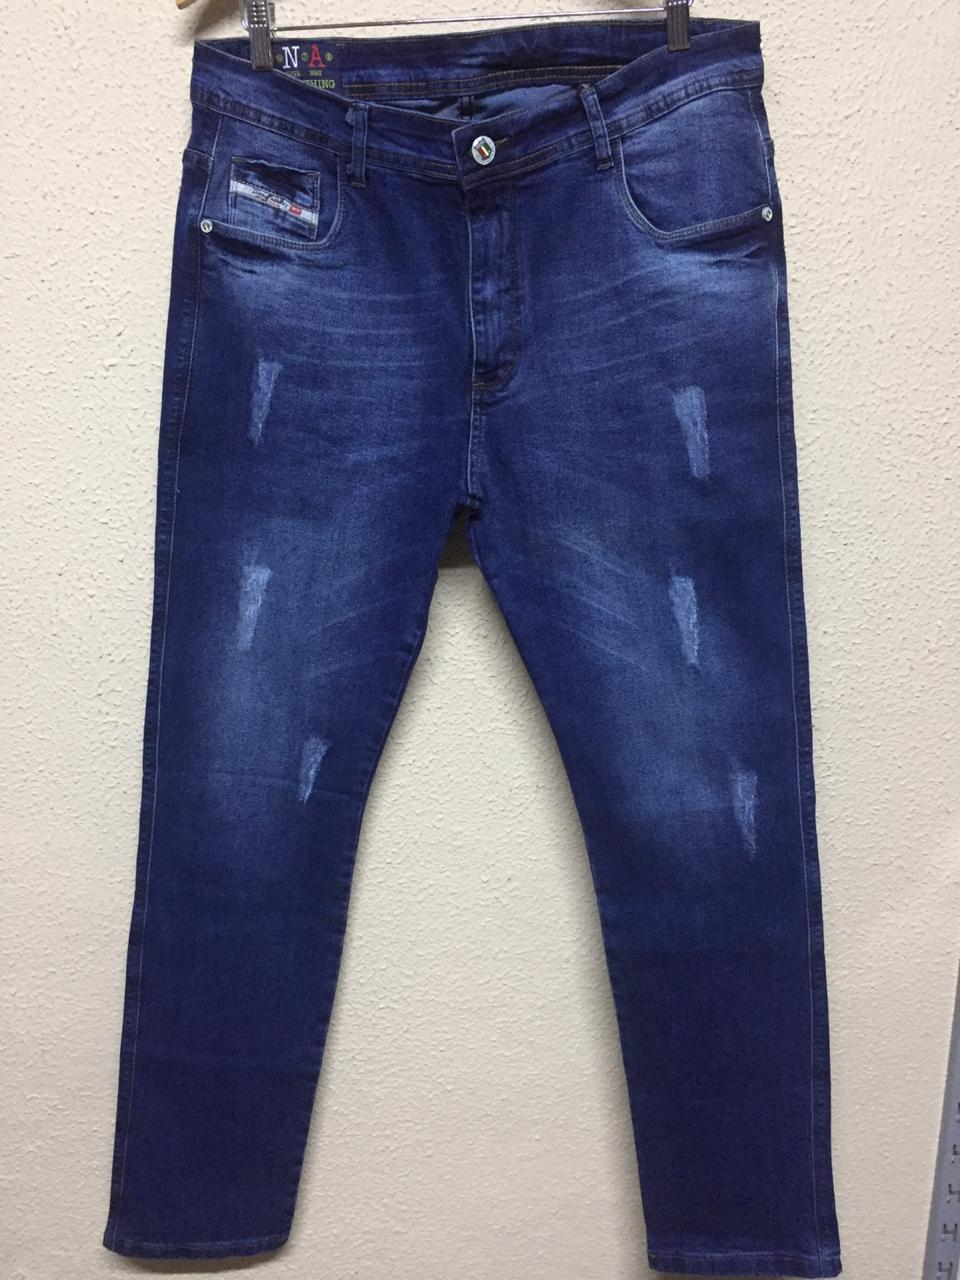 Calça Masculina Empório Armani Jeans Lisa - Jeans